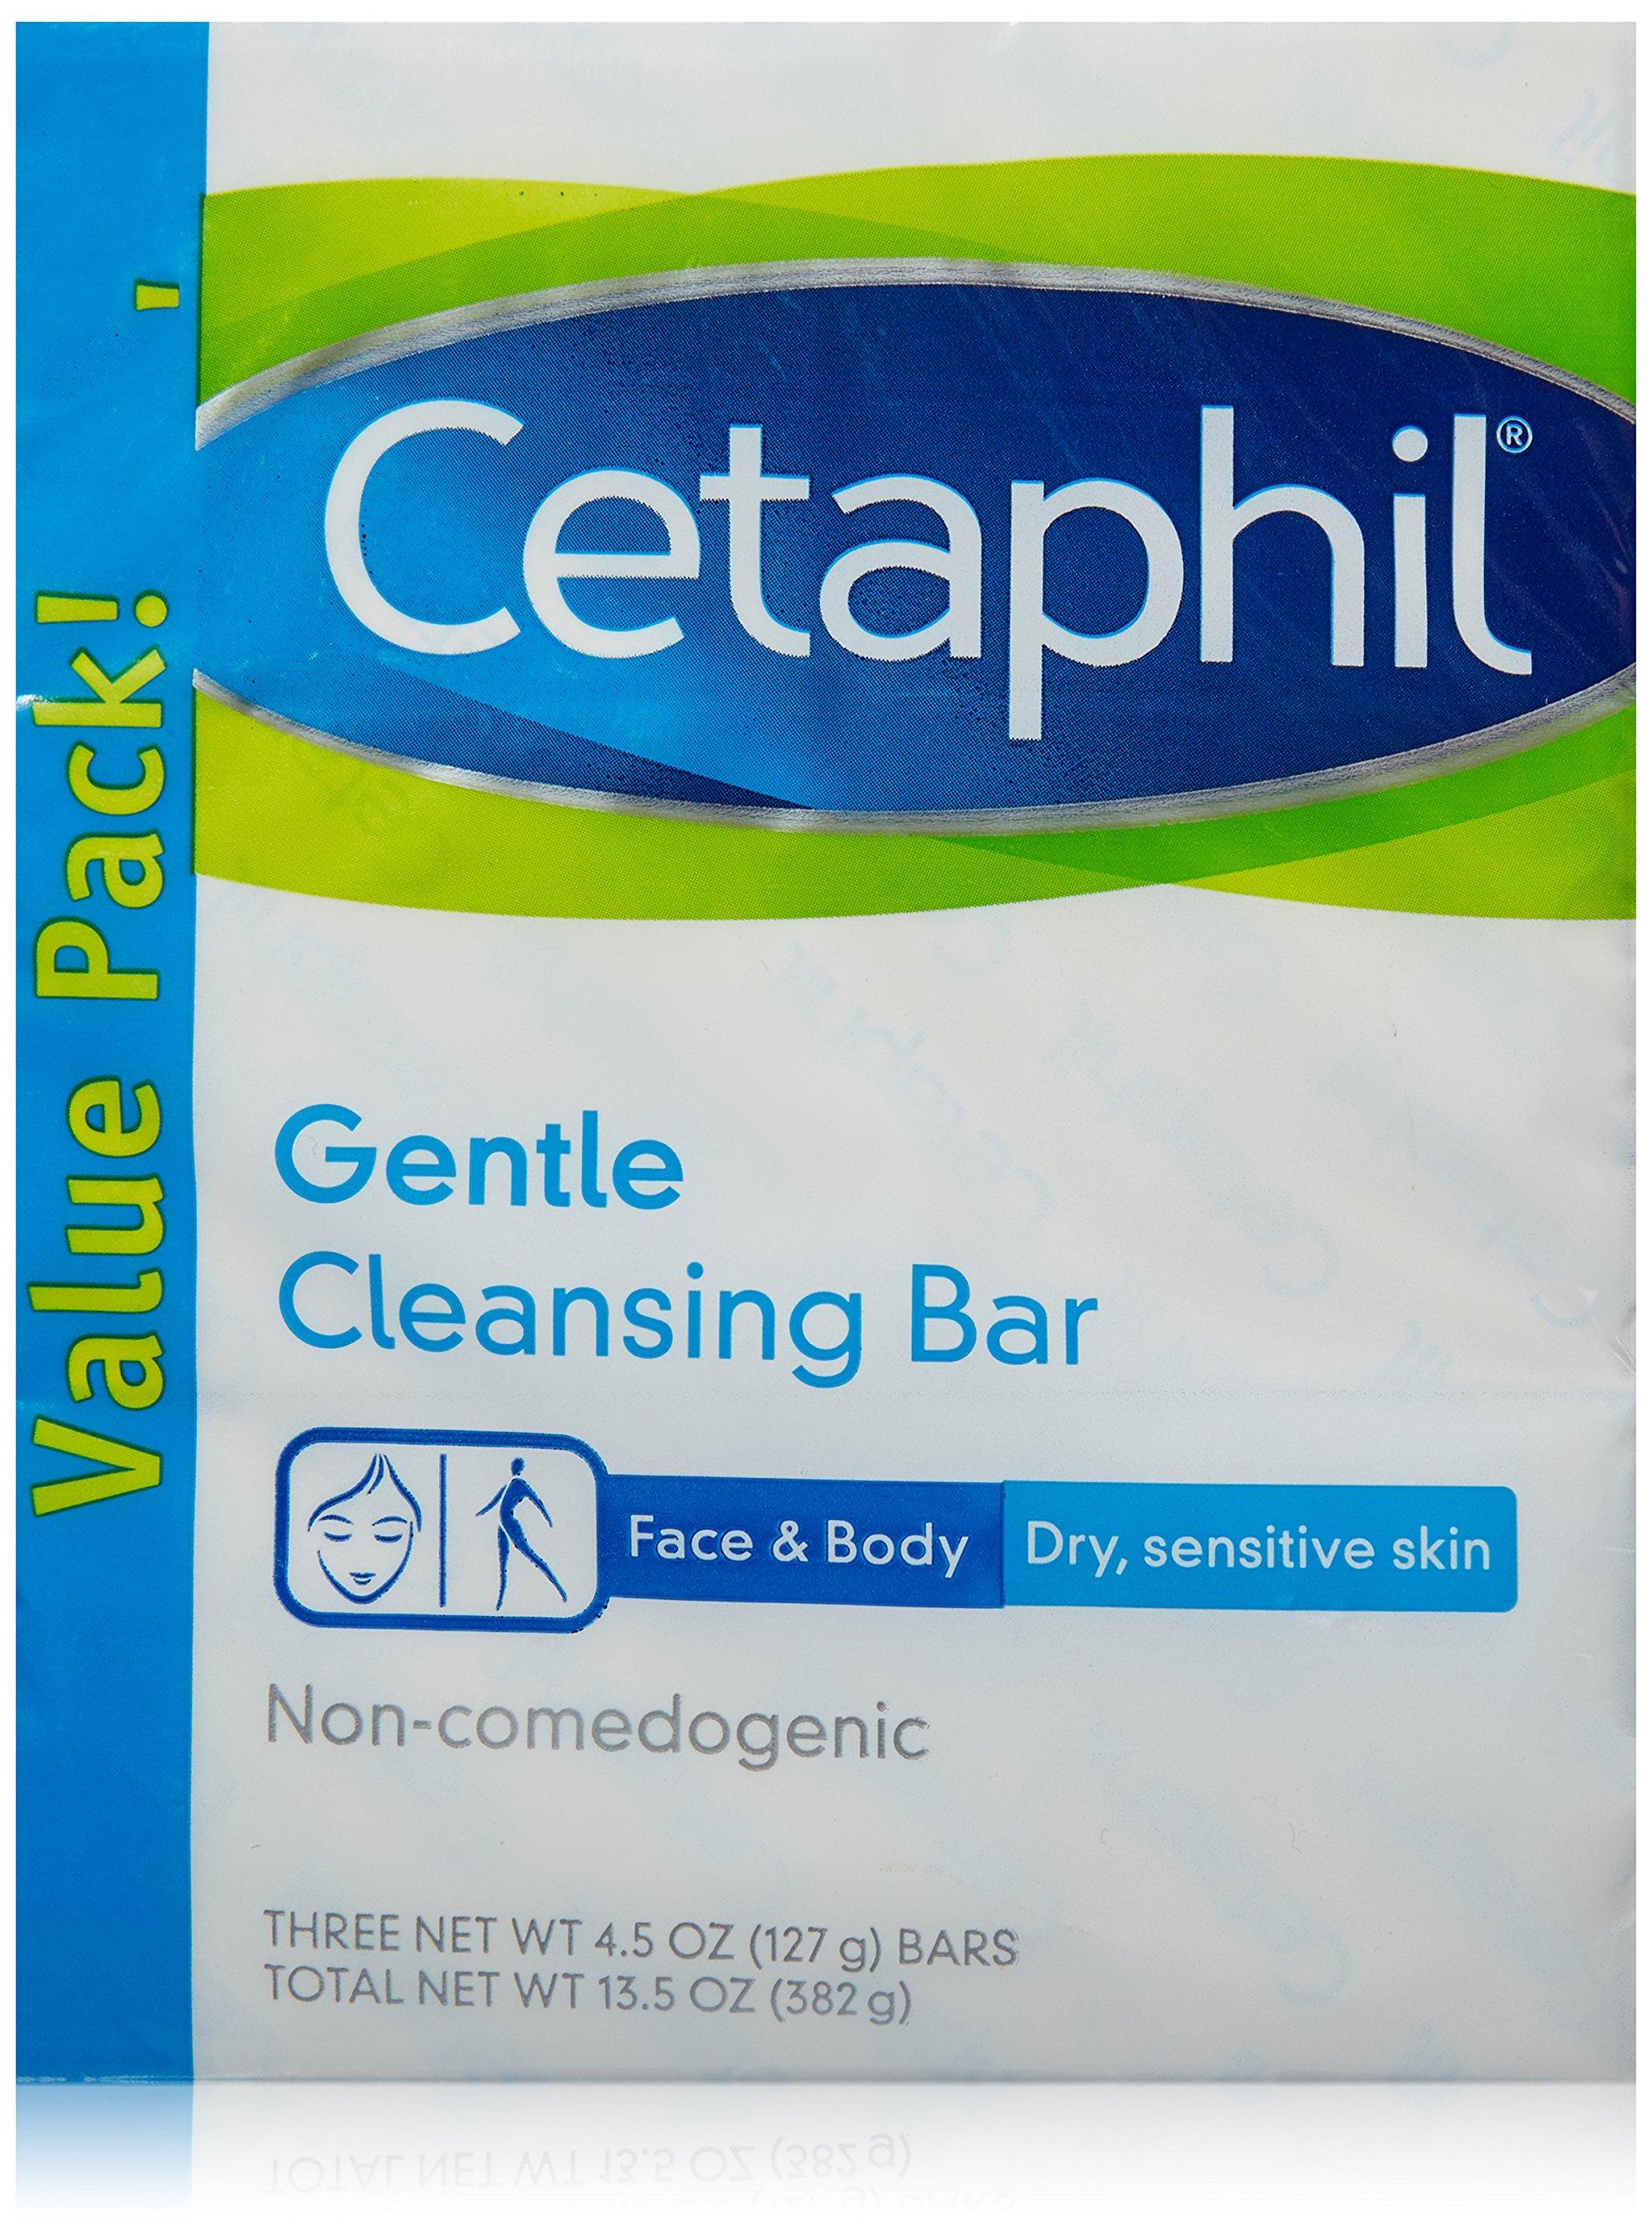 Cetaphil Gentle Cleansing Bar, 4.5 oz, 3 Count